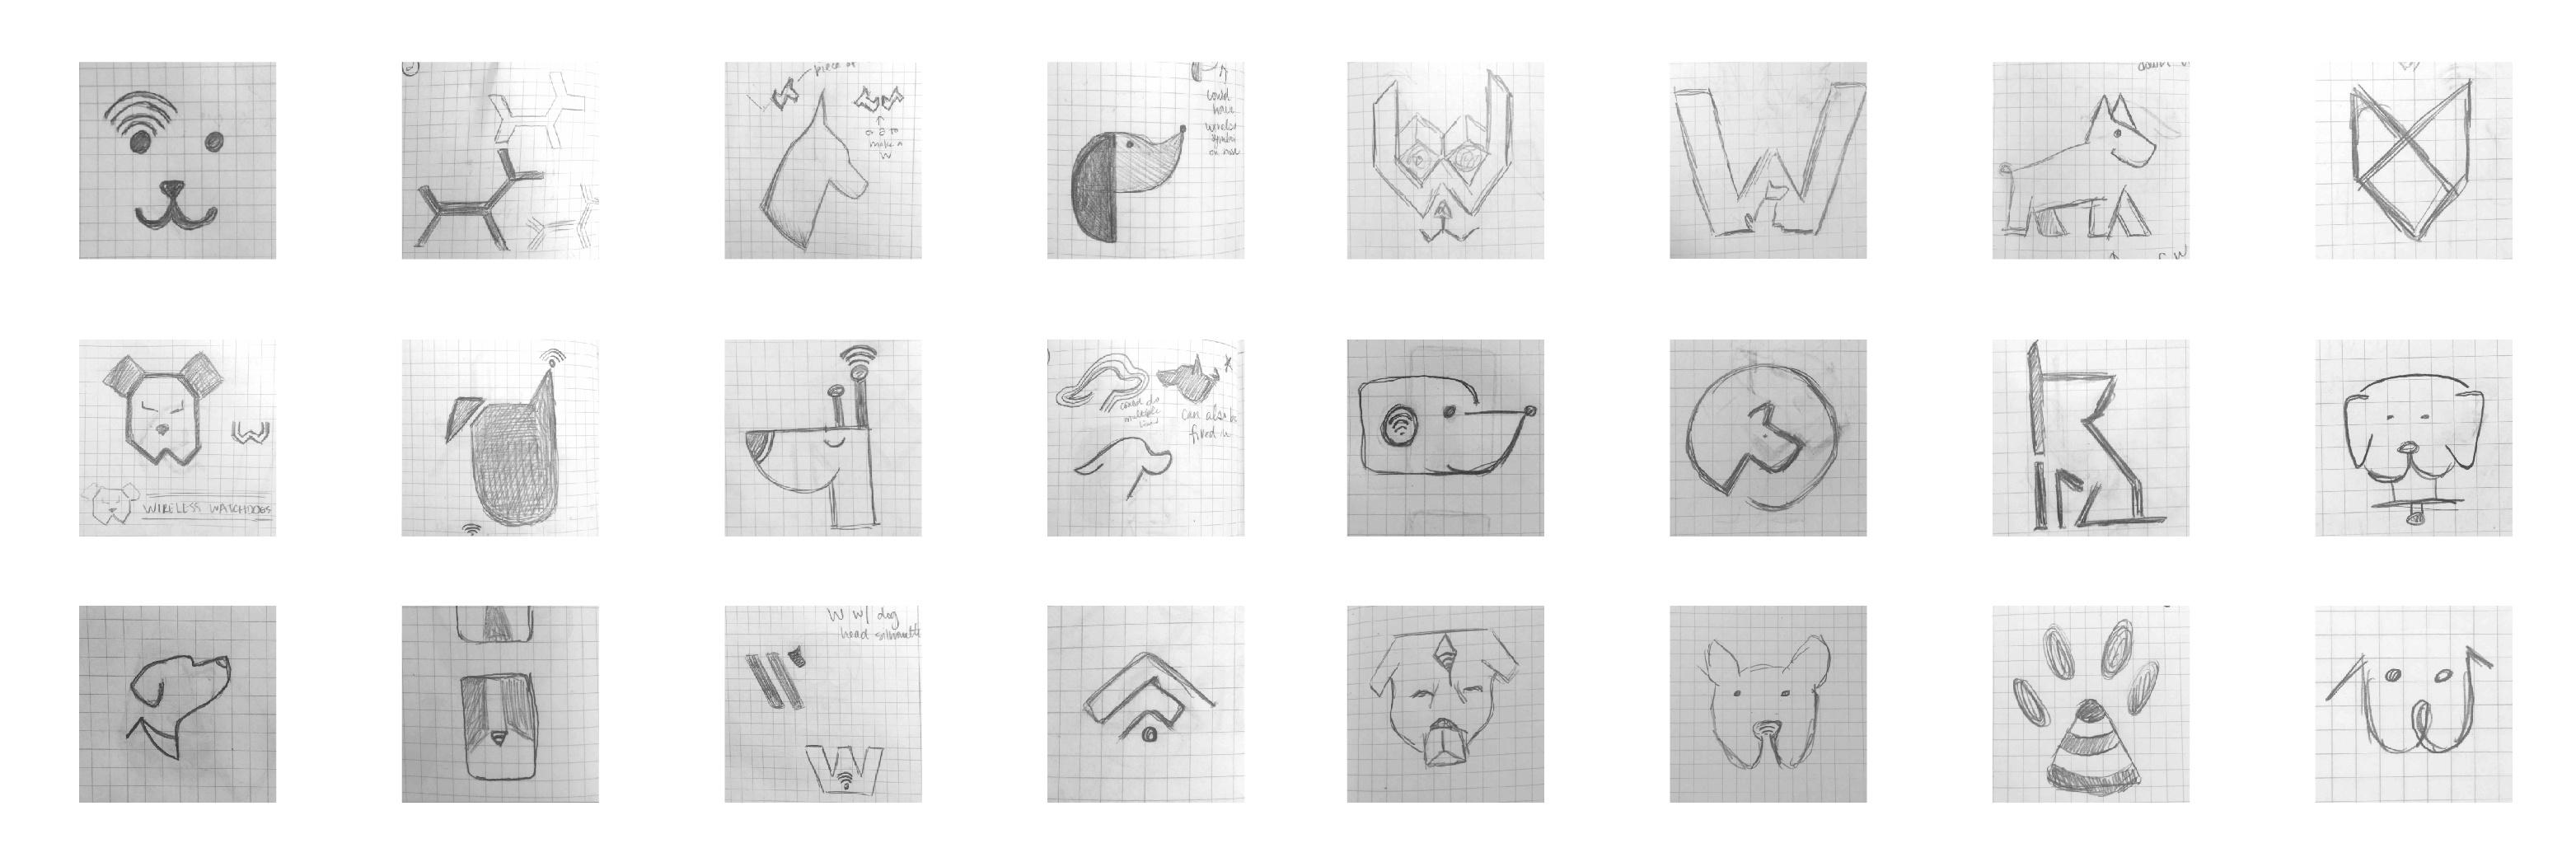 WW_Logo_Redesign_Concept_Sketches-04.jpg